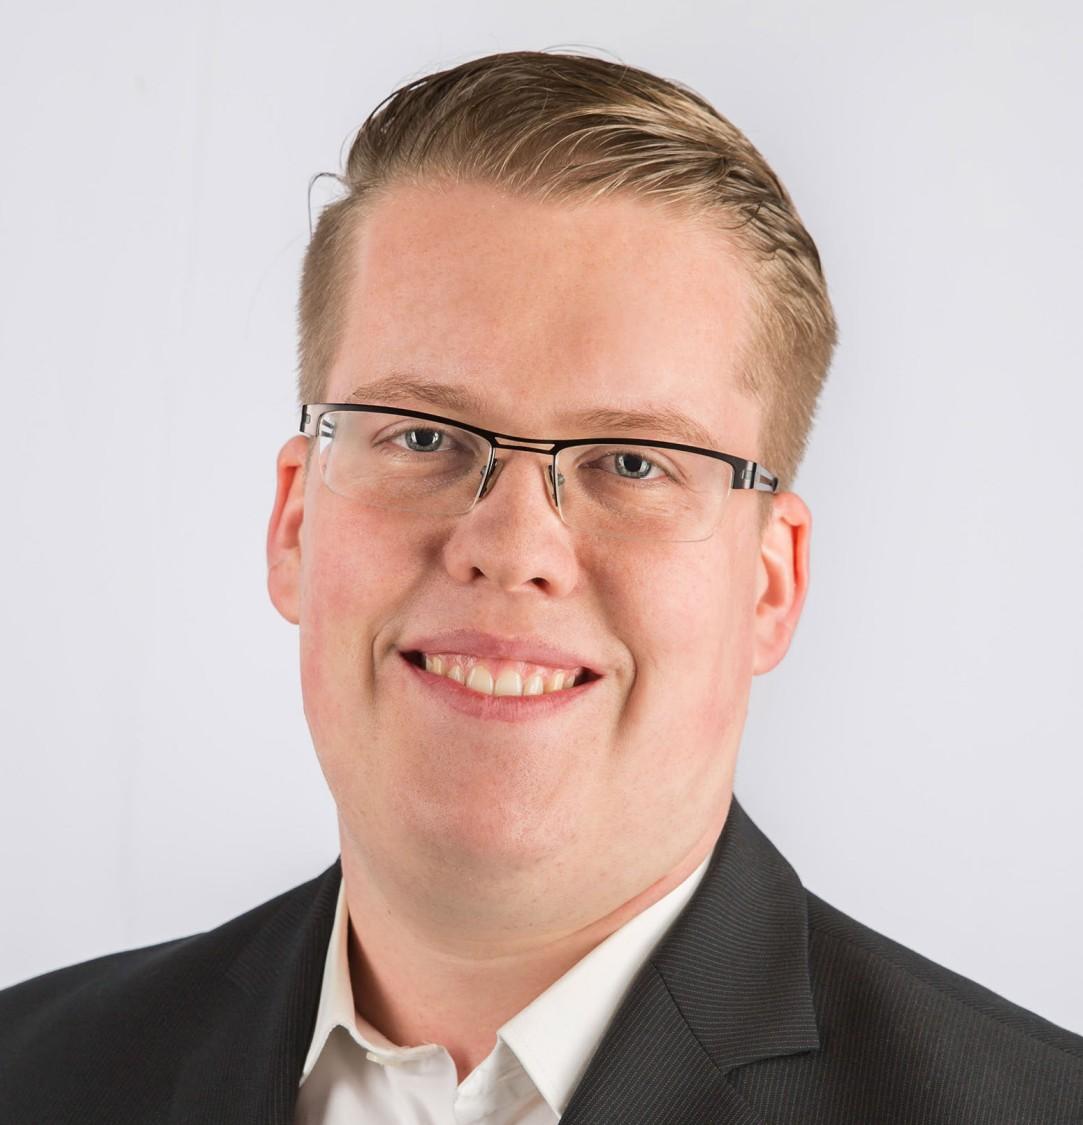 Fabian Rademacher